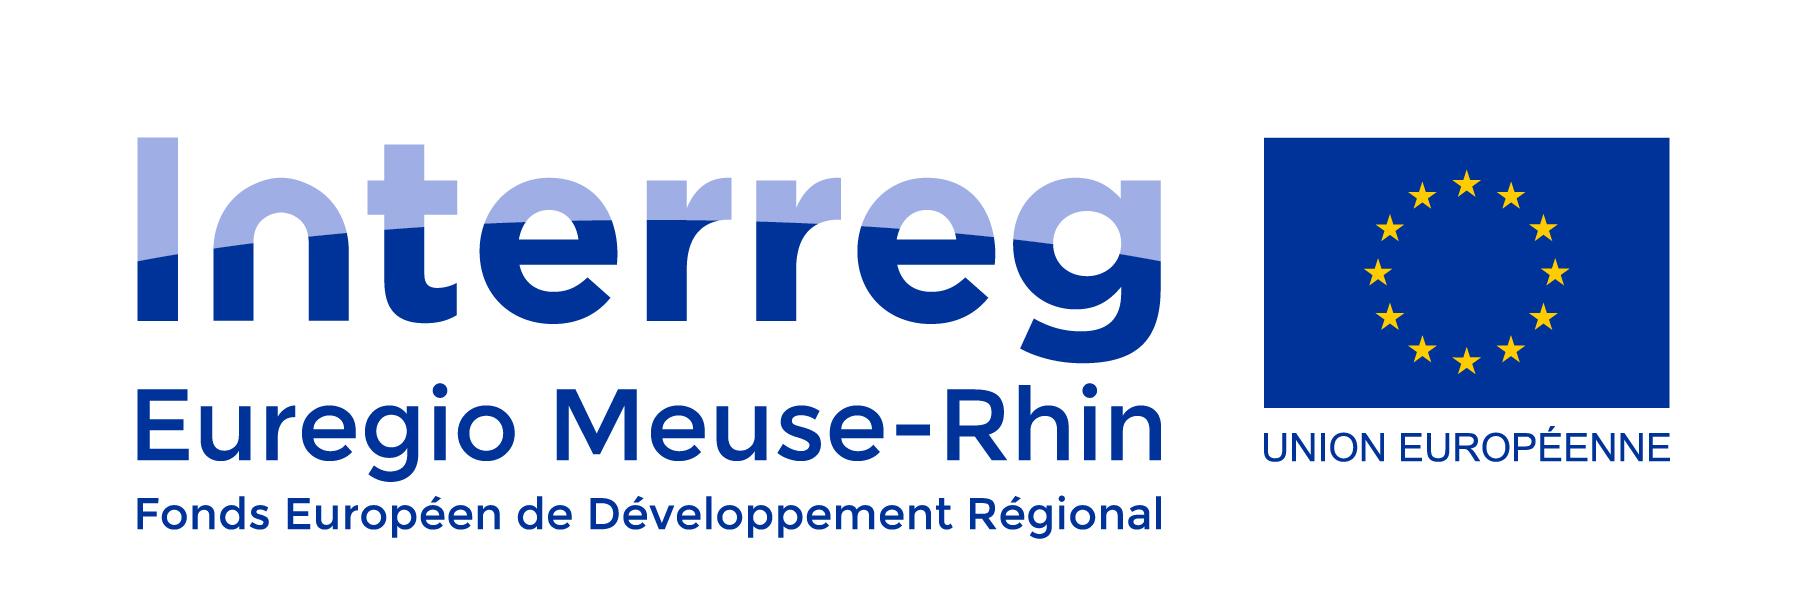 Interreg Euregio Meuse-Rhine FR FUND RGB